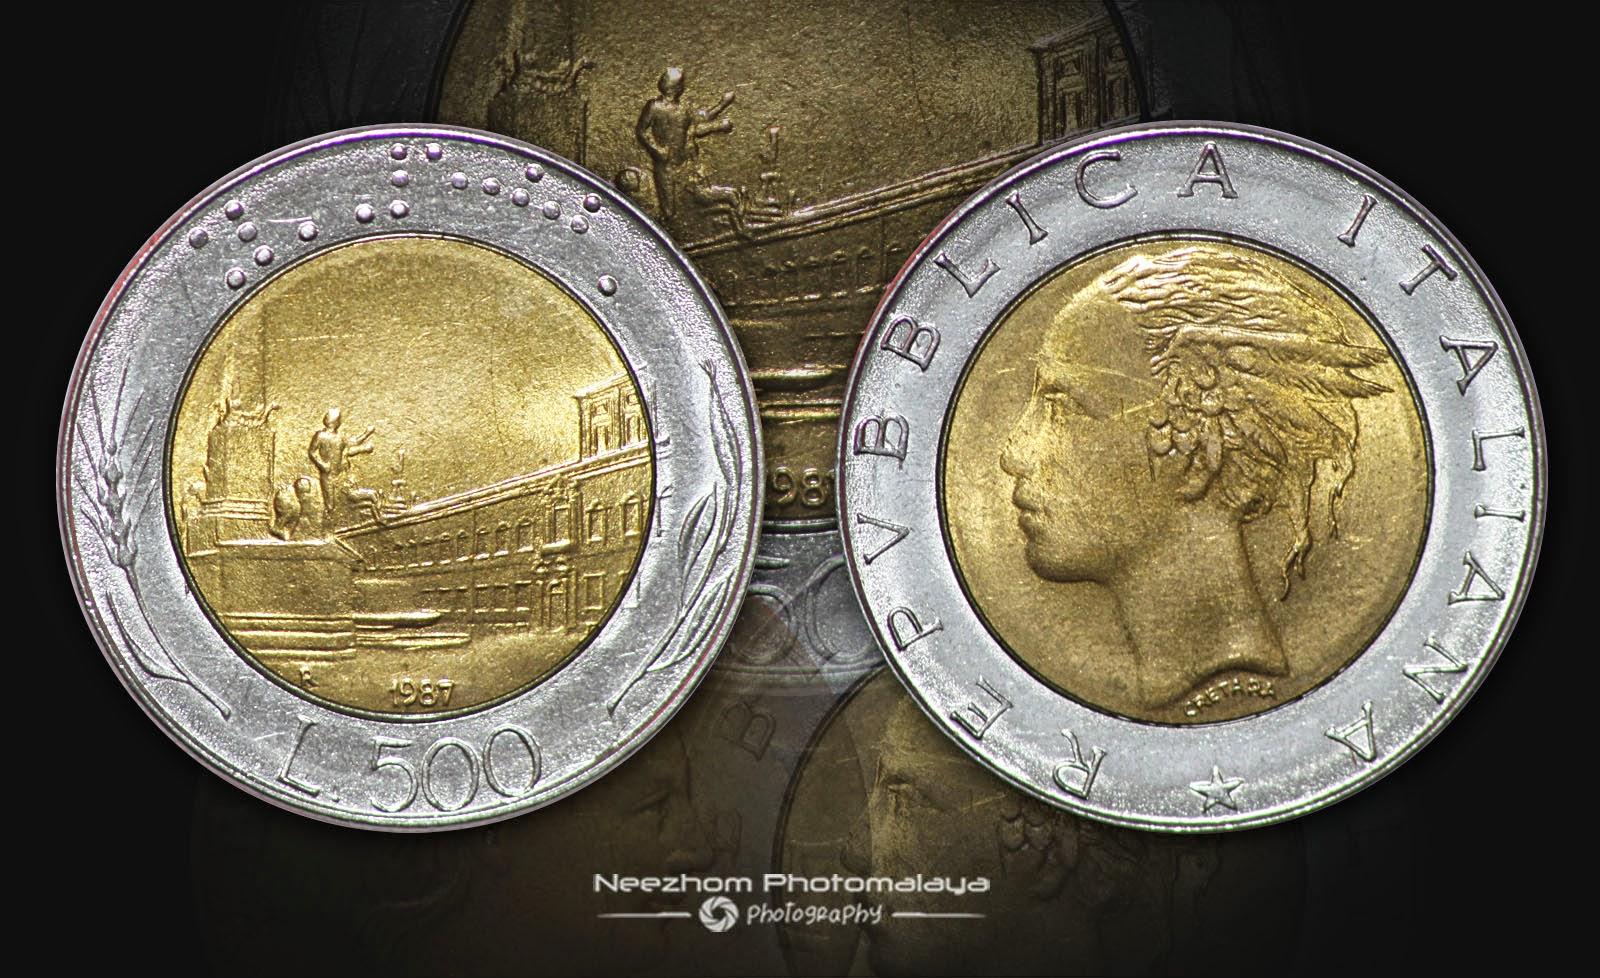 500 Lire 1987 Italy bi metal coin